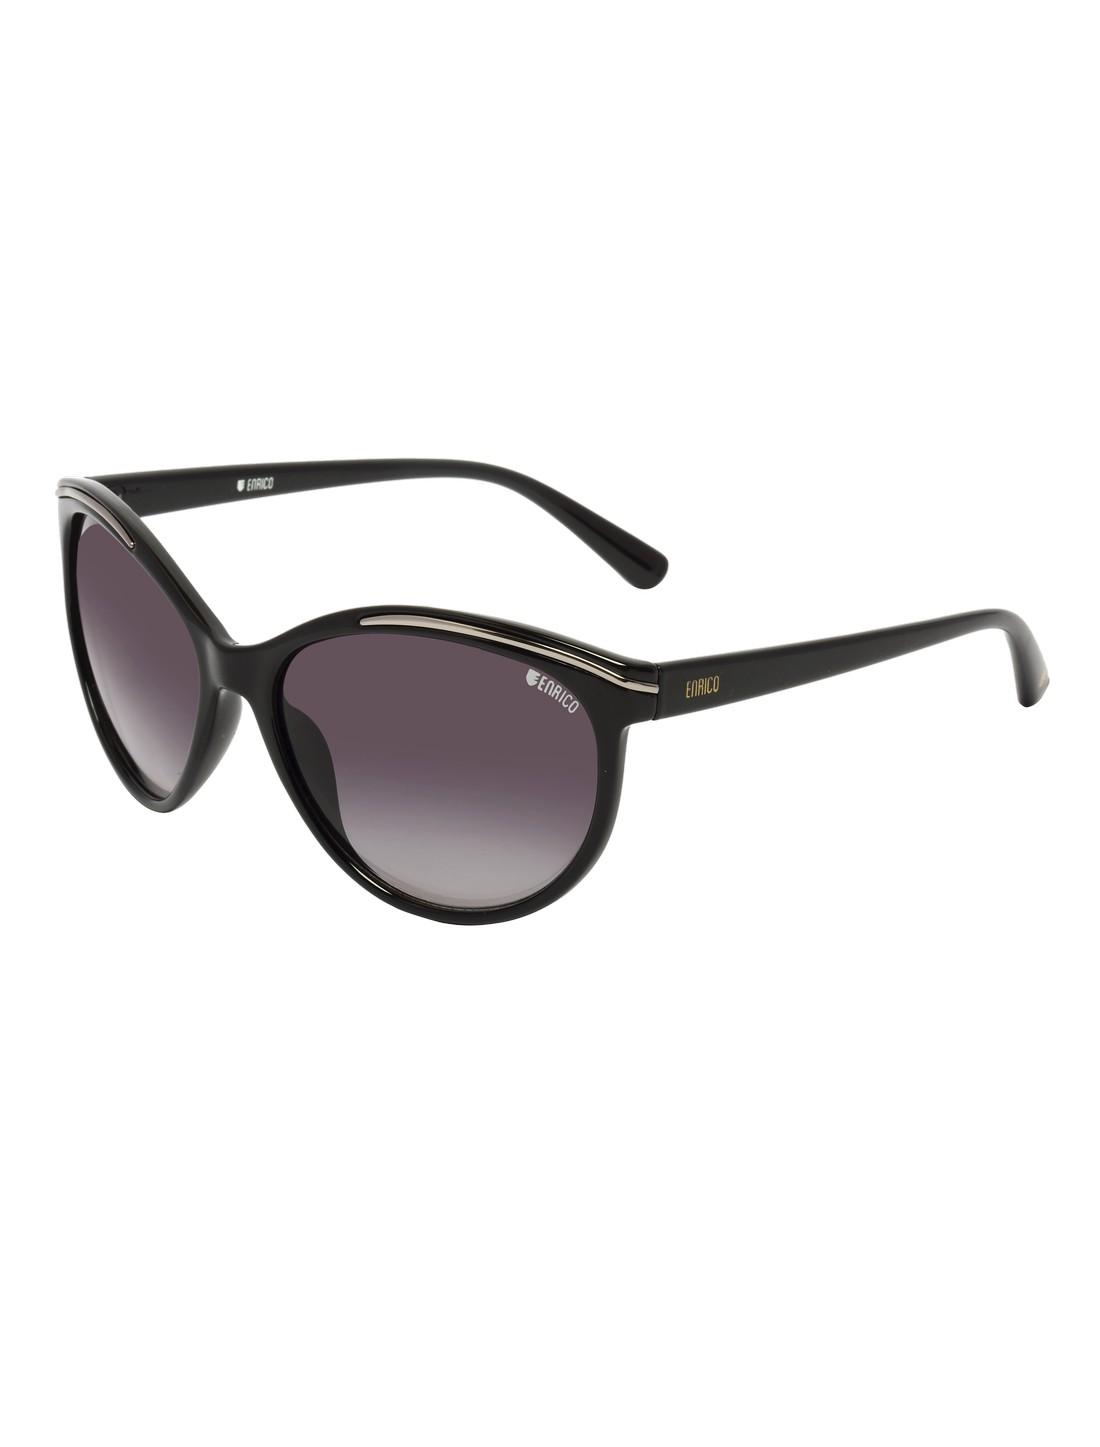 ENRICO   ENRICO Hazard UV Protected Cateye Sunglasses for Women ( Lens - Purple   Frame - Black)